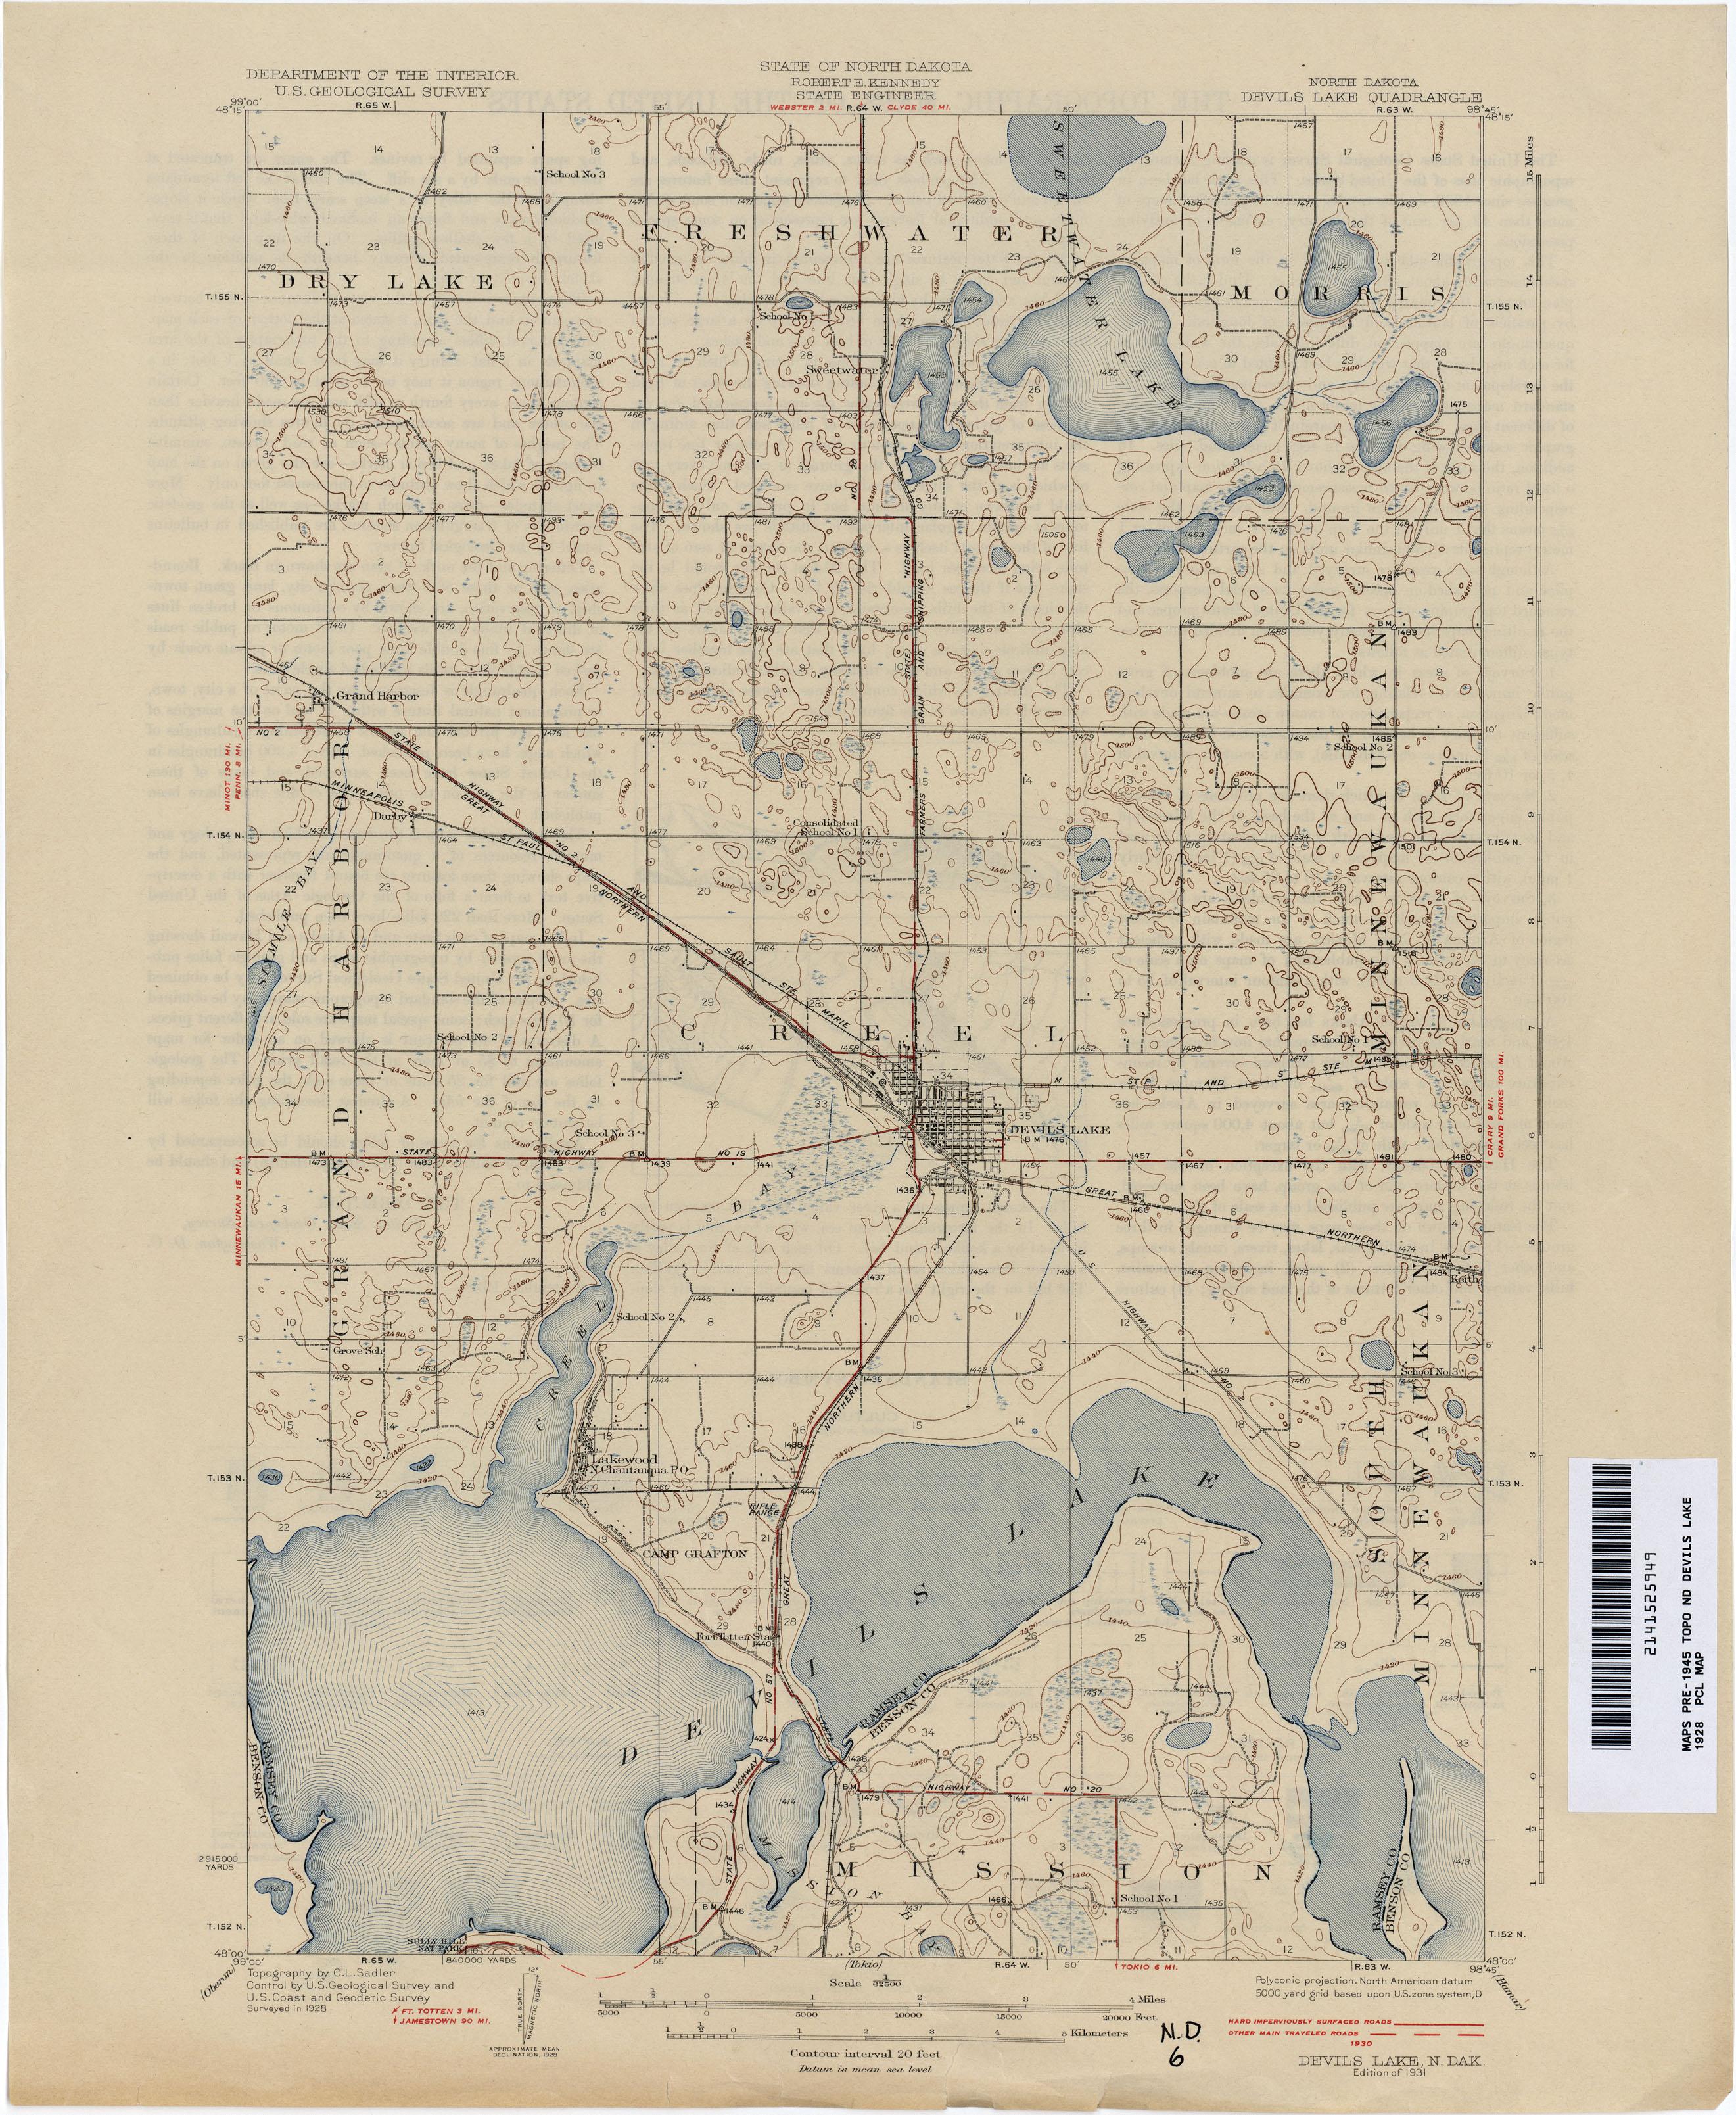 North Dakota Historical Topographic Maps - Perry-Castañeda ...